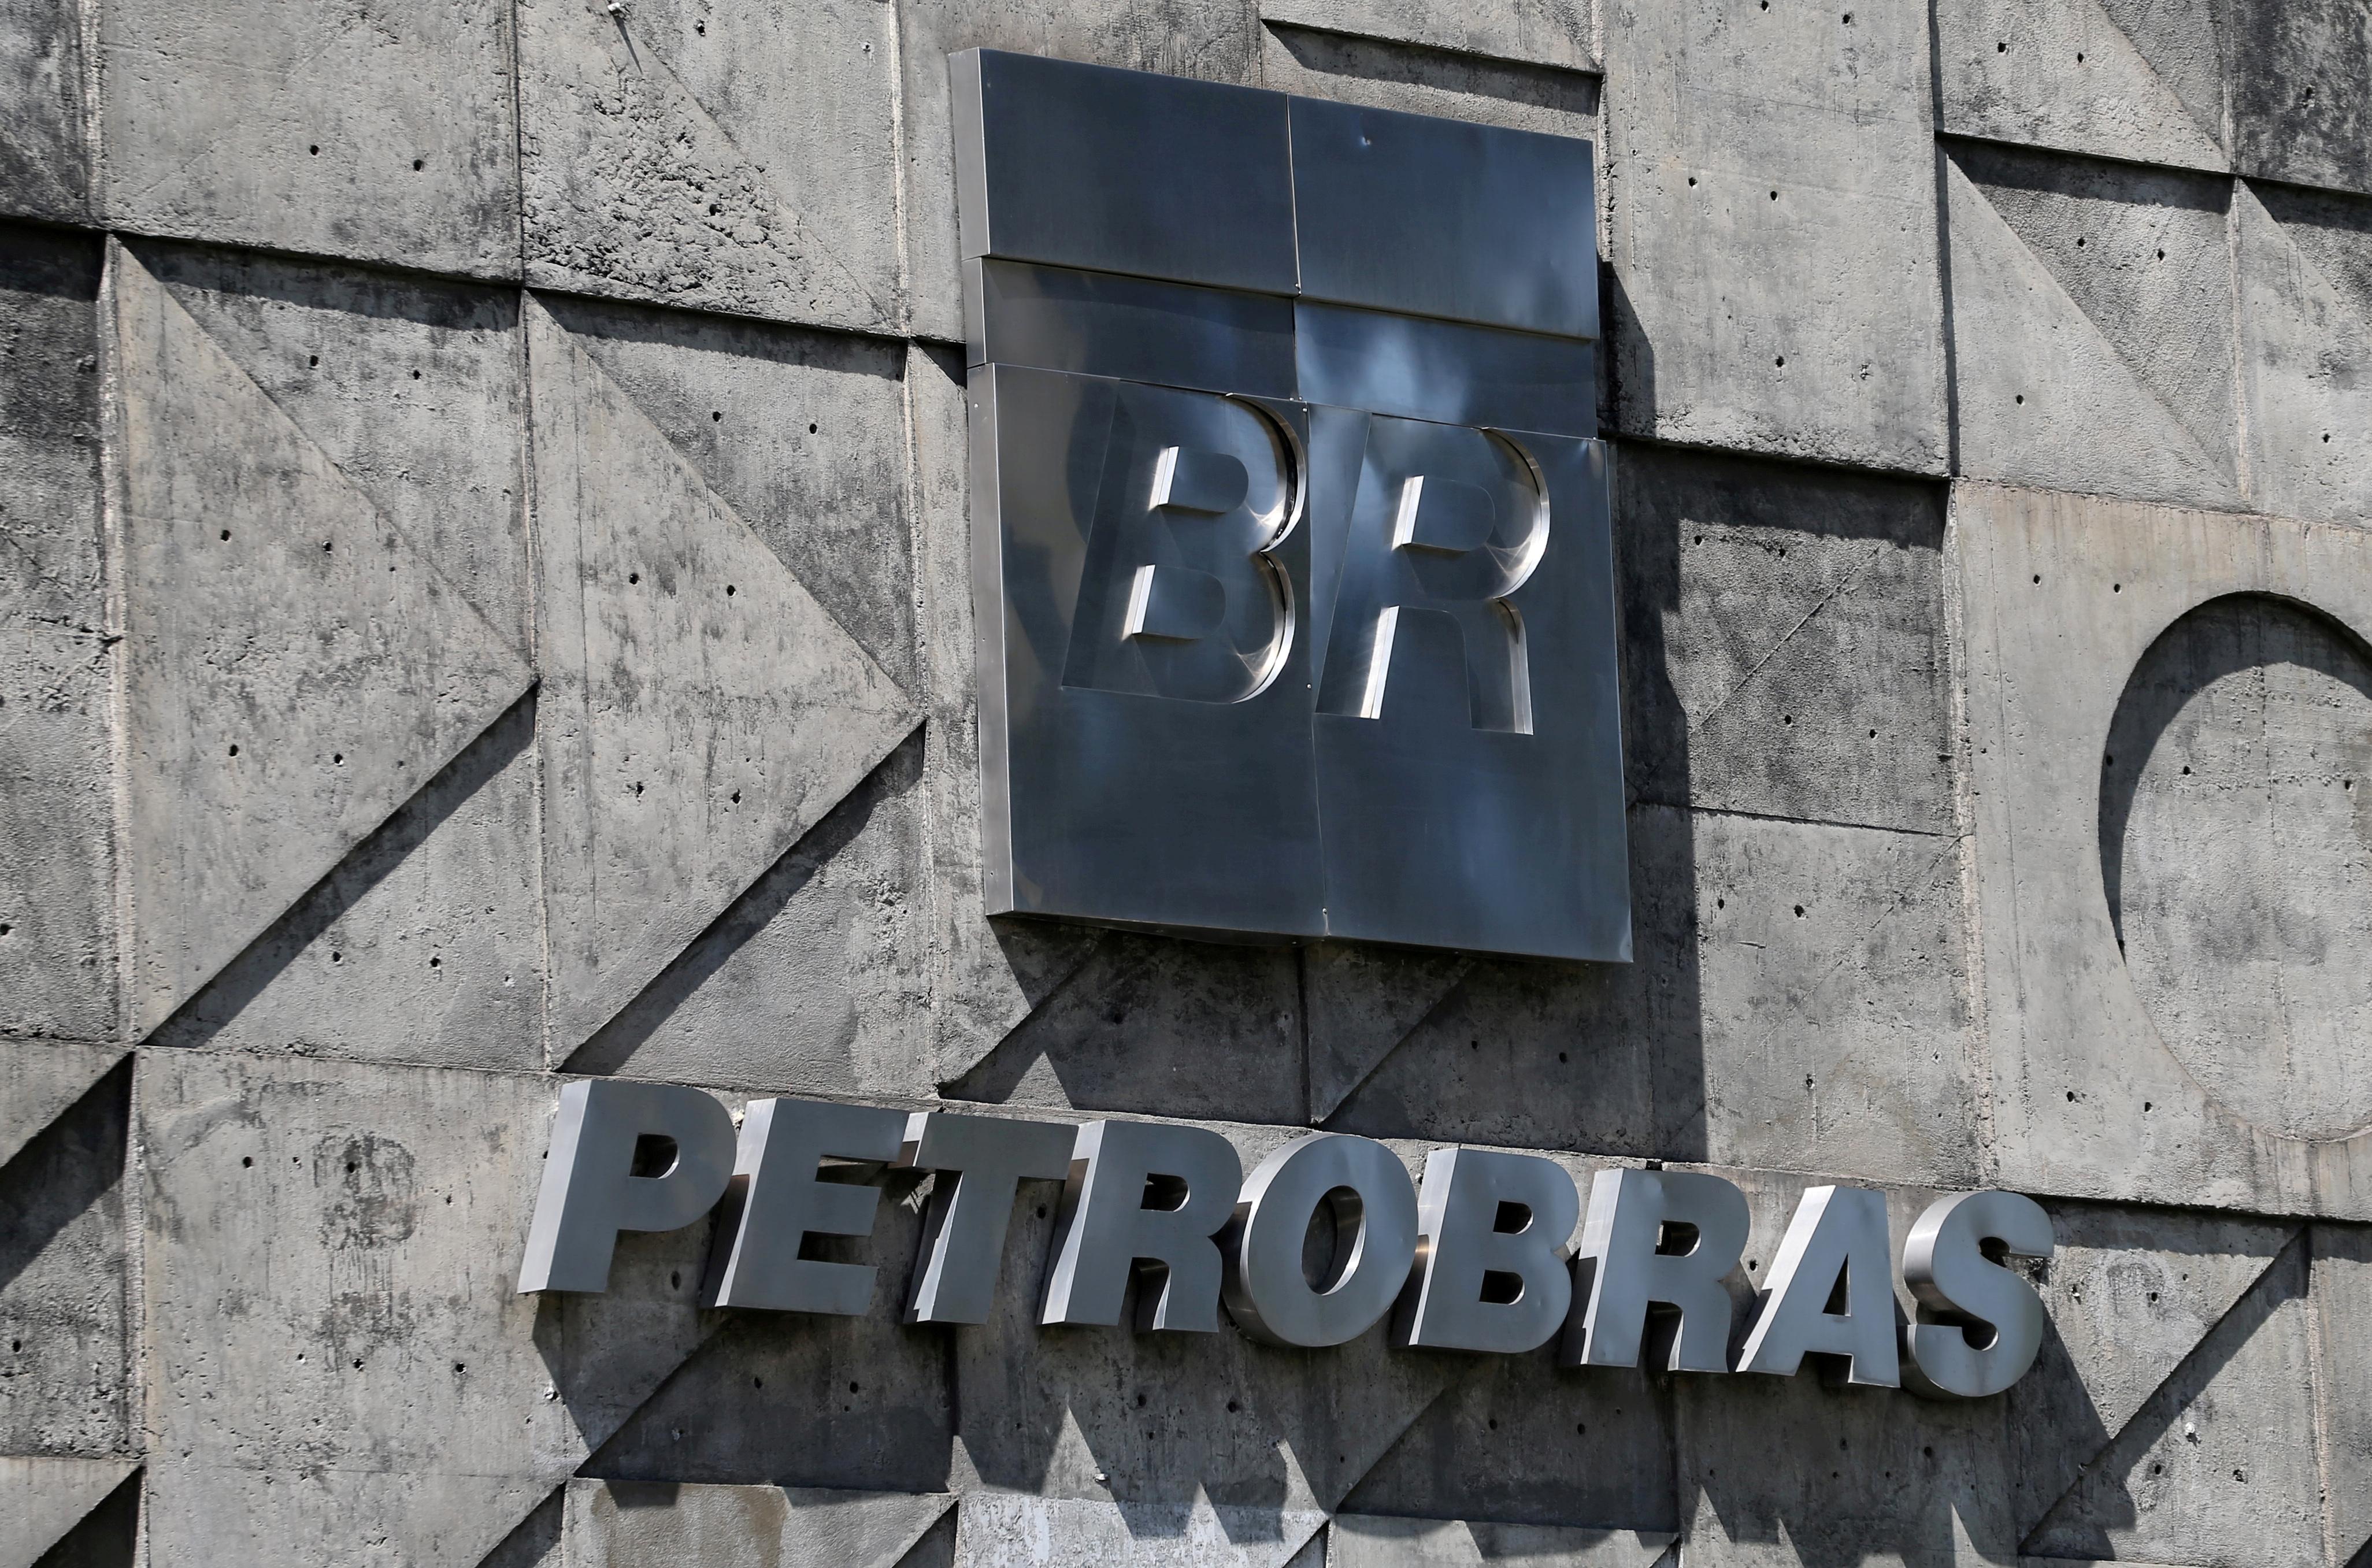 Privatize Petrobras? Lofty ambition, higher hurdles